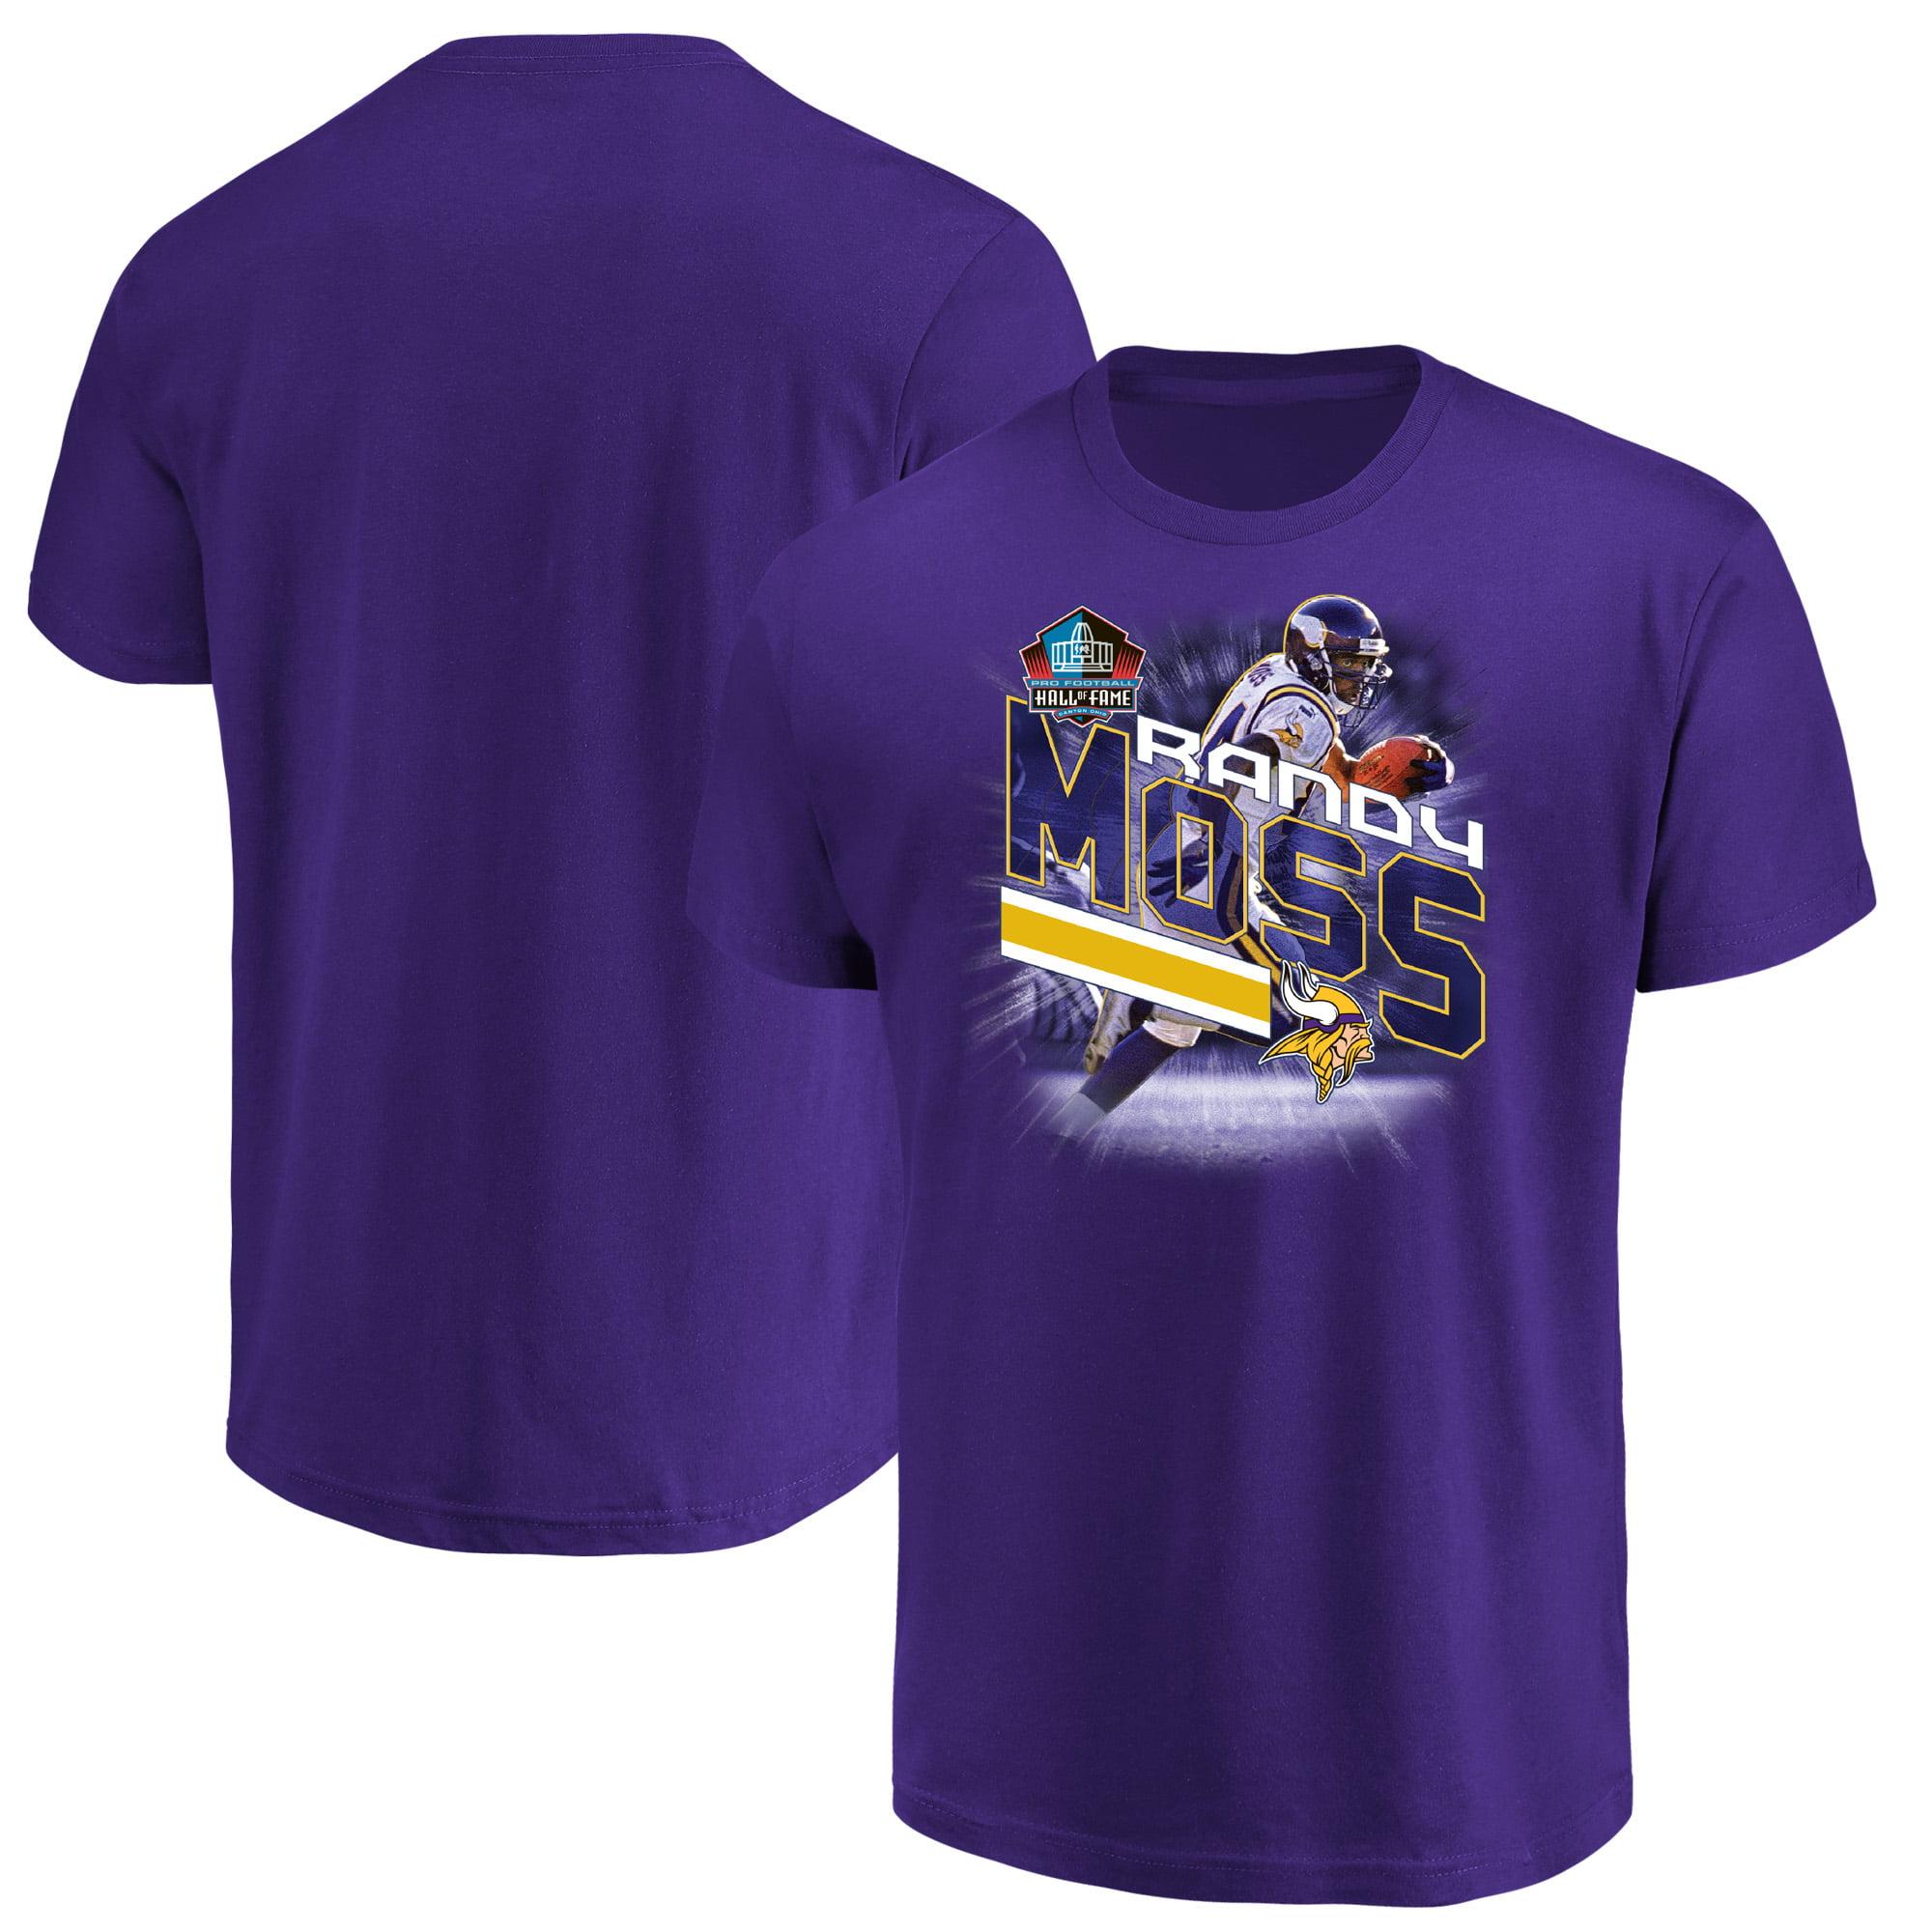 Randy Moss Minnesota Vikings Majestic NFL Hall of Fame Inductee Player Illustration T-Shirt - Purple